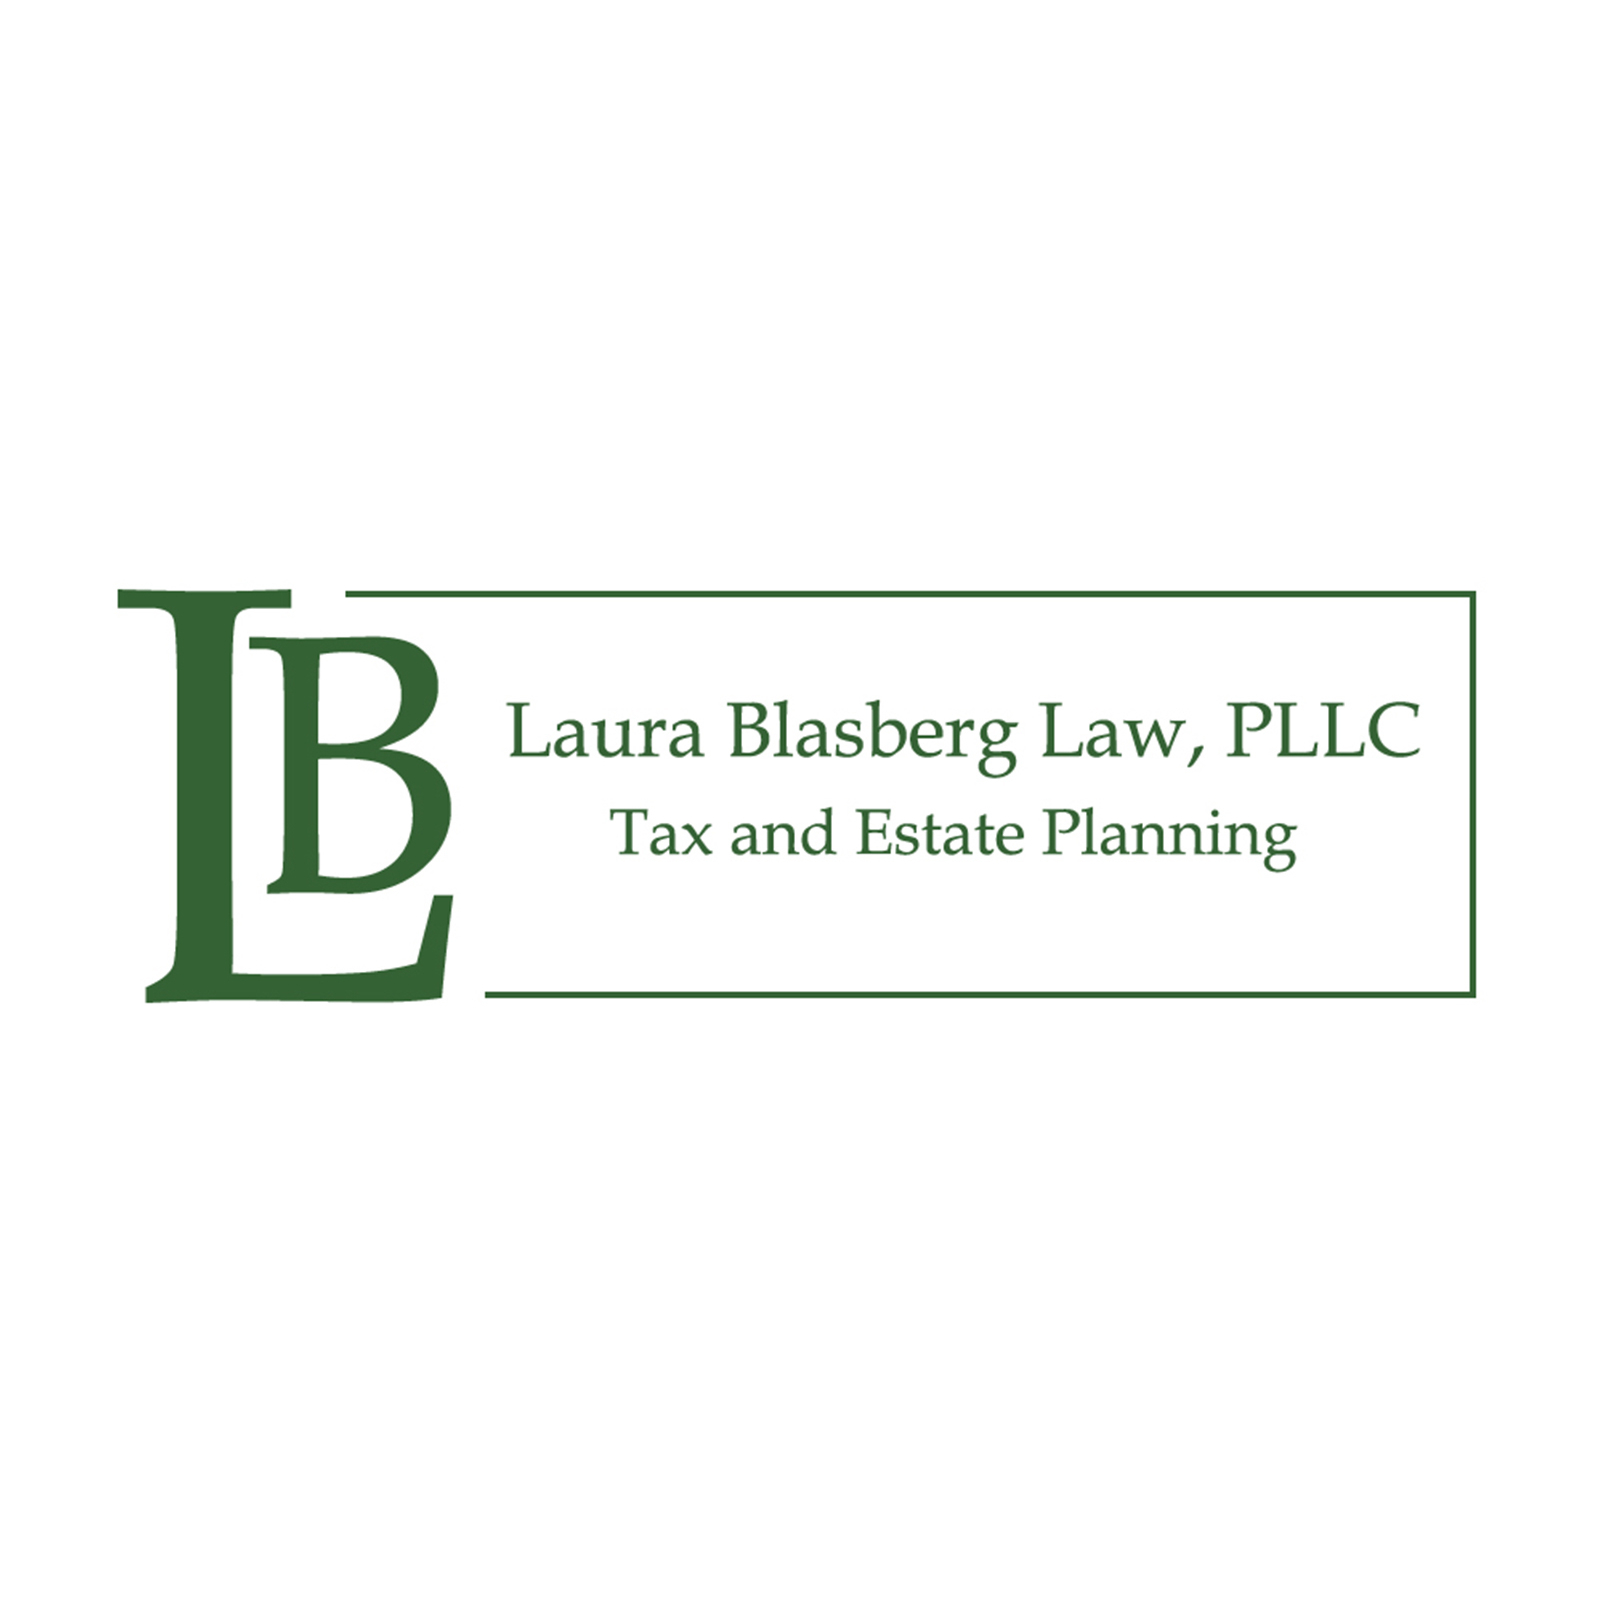 Laura Blasberg Law, PLLC